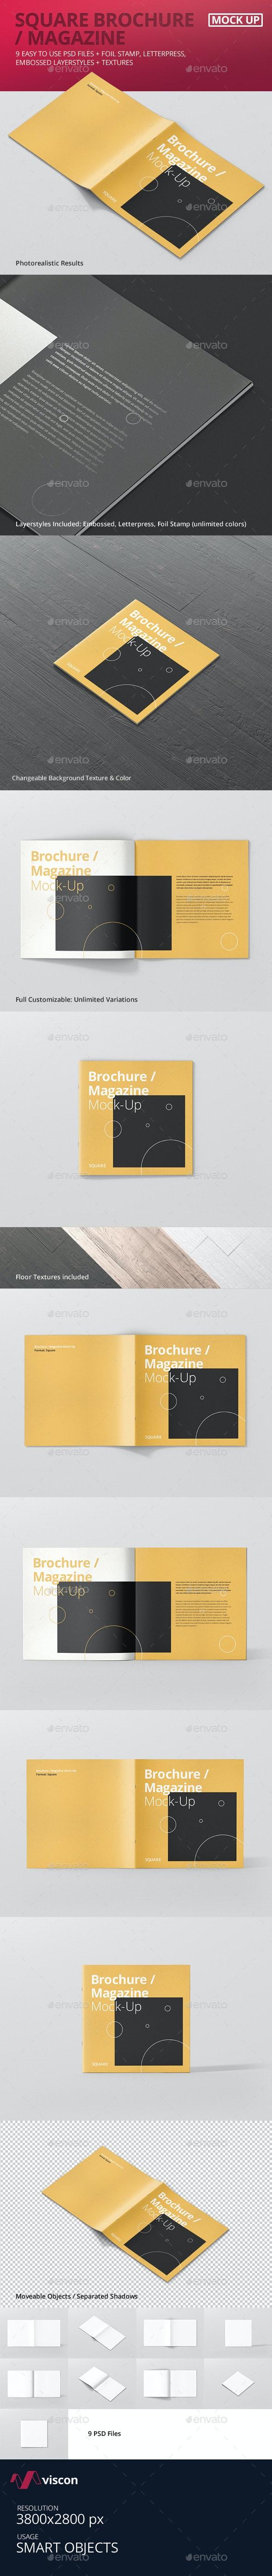 Square Brochure / Magazine Mock-Up - Magazines Print